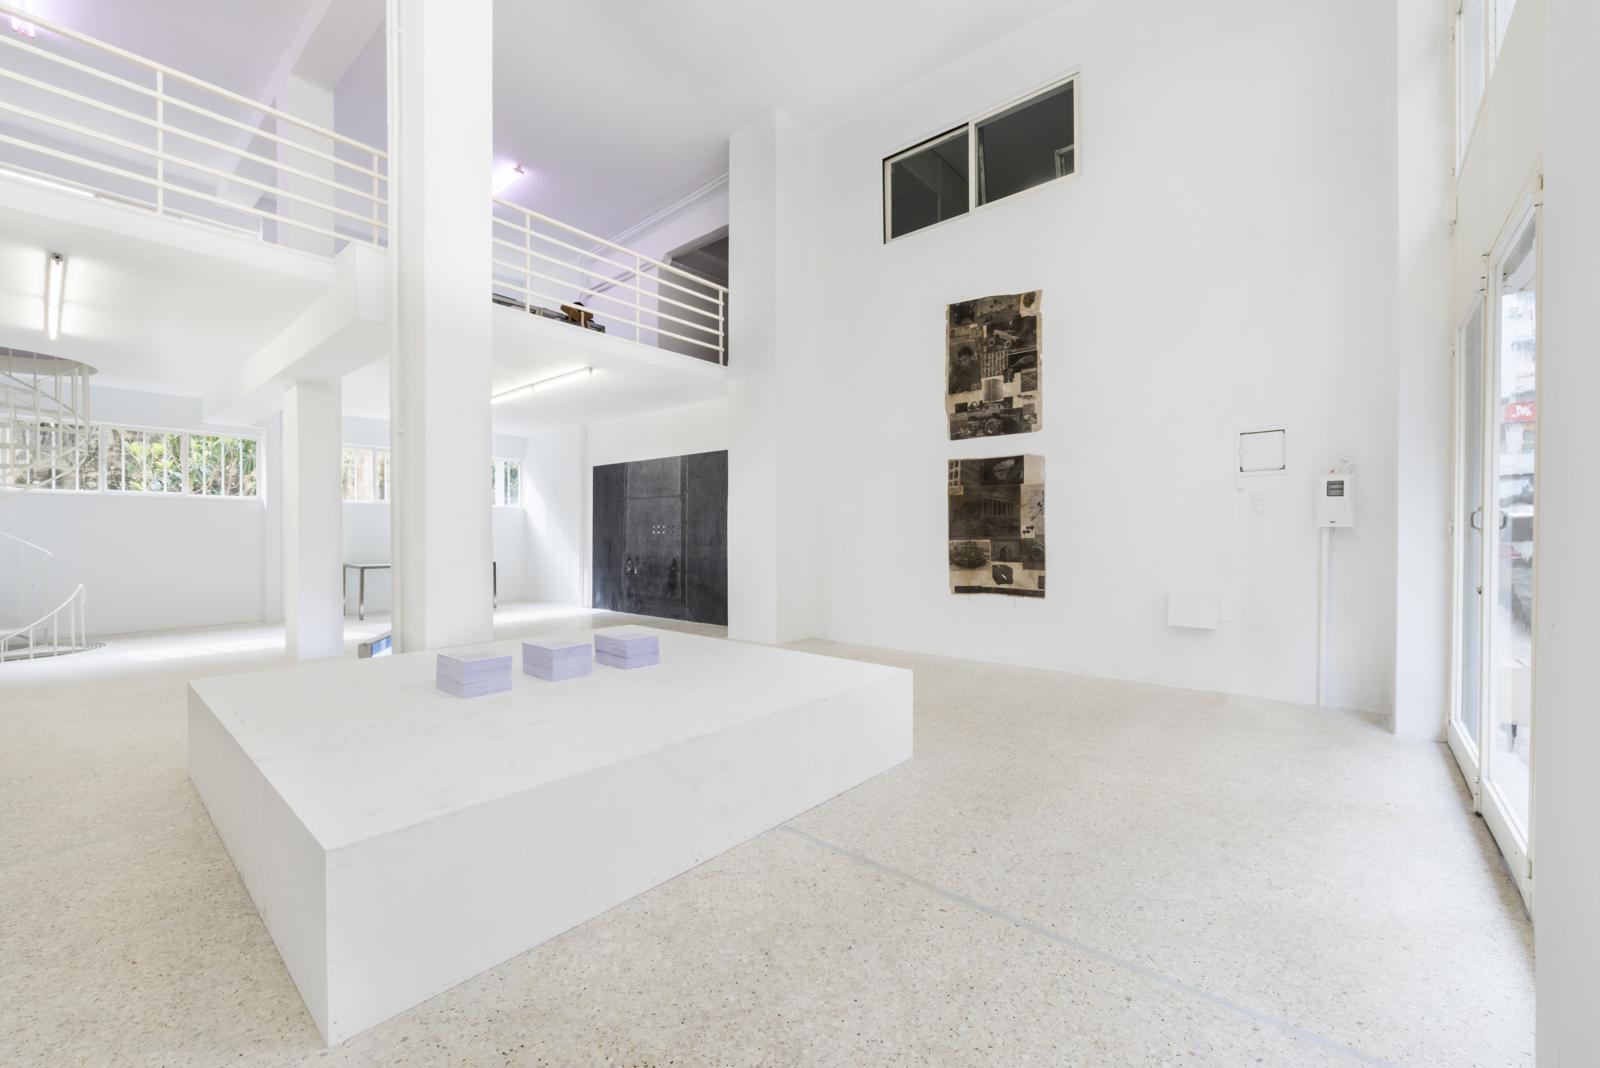 Roundcube architectural photography, maria mavropoulou, Μαρία Μαυροπούλου,   φωτογράφιση εκθέσεων, αρχιτεκτονική φωτογραφία, φωτογράφιση εσωτερικών χώρων, φωτογράφιση έργων τέχνης , photographer, athens , greece,  αθήνα, ελλάδα, float gallery